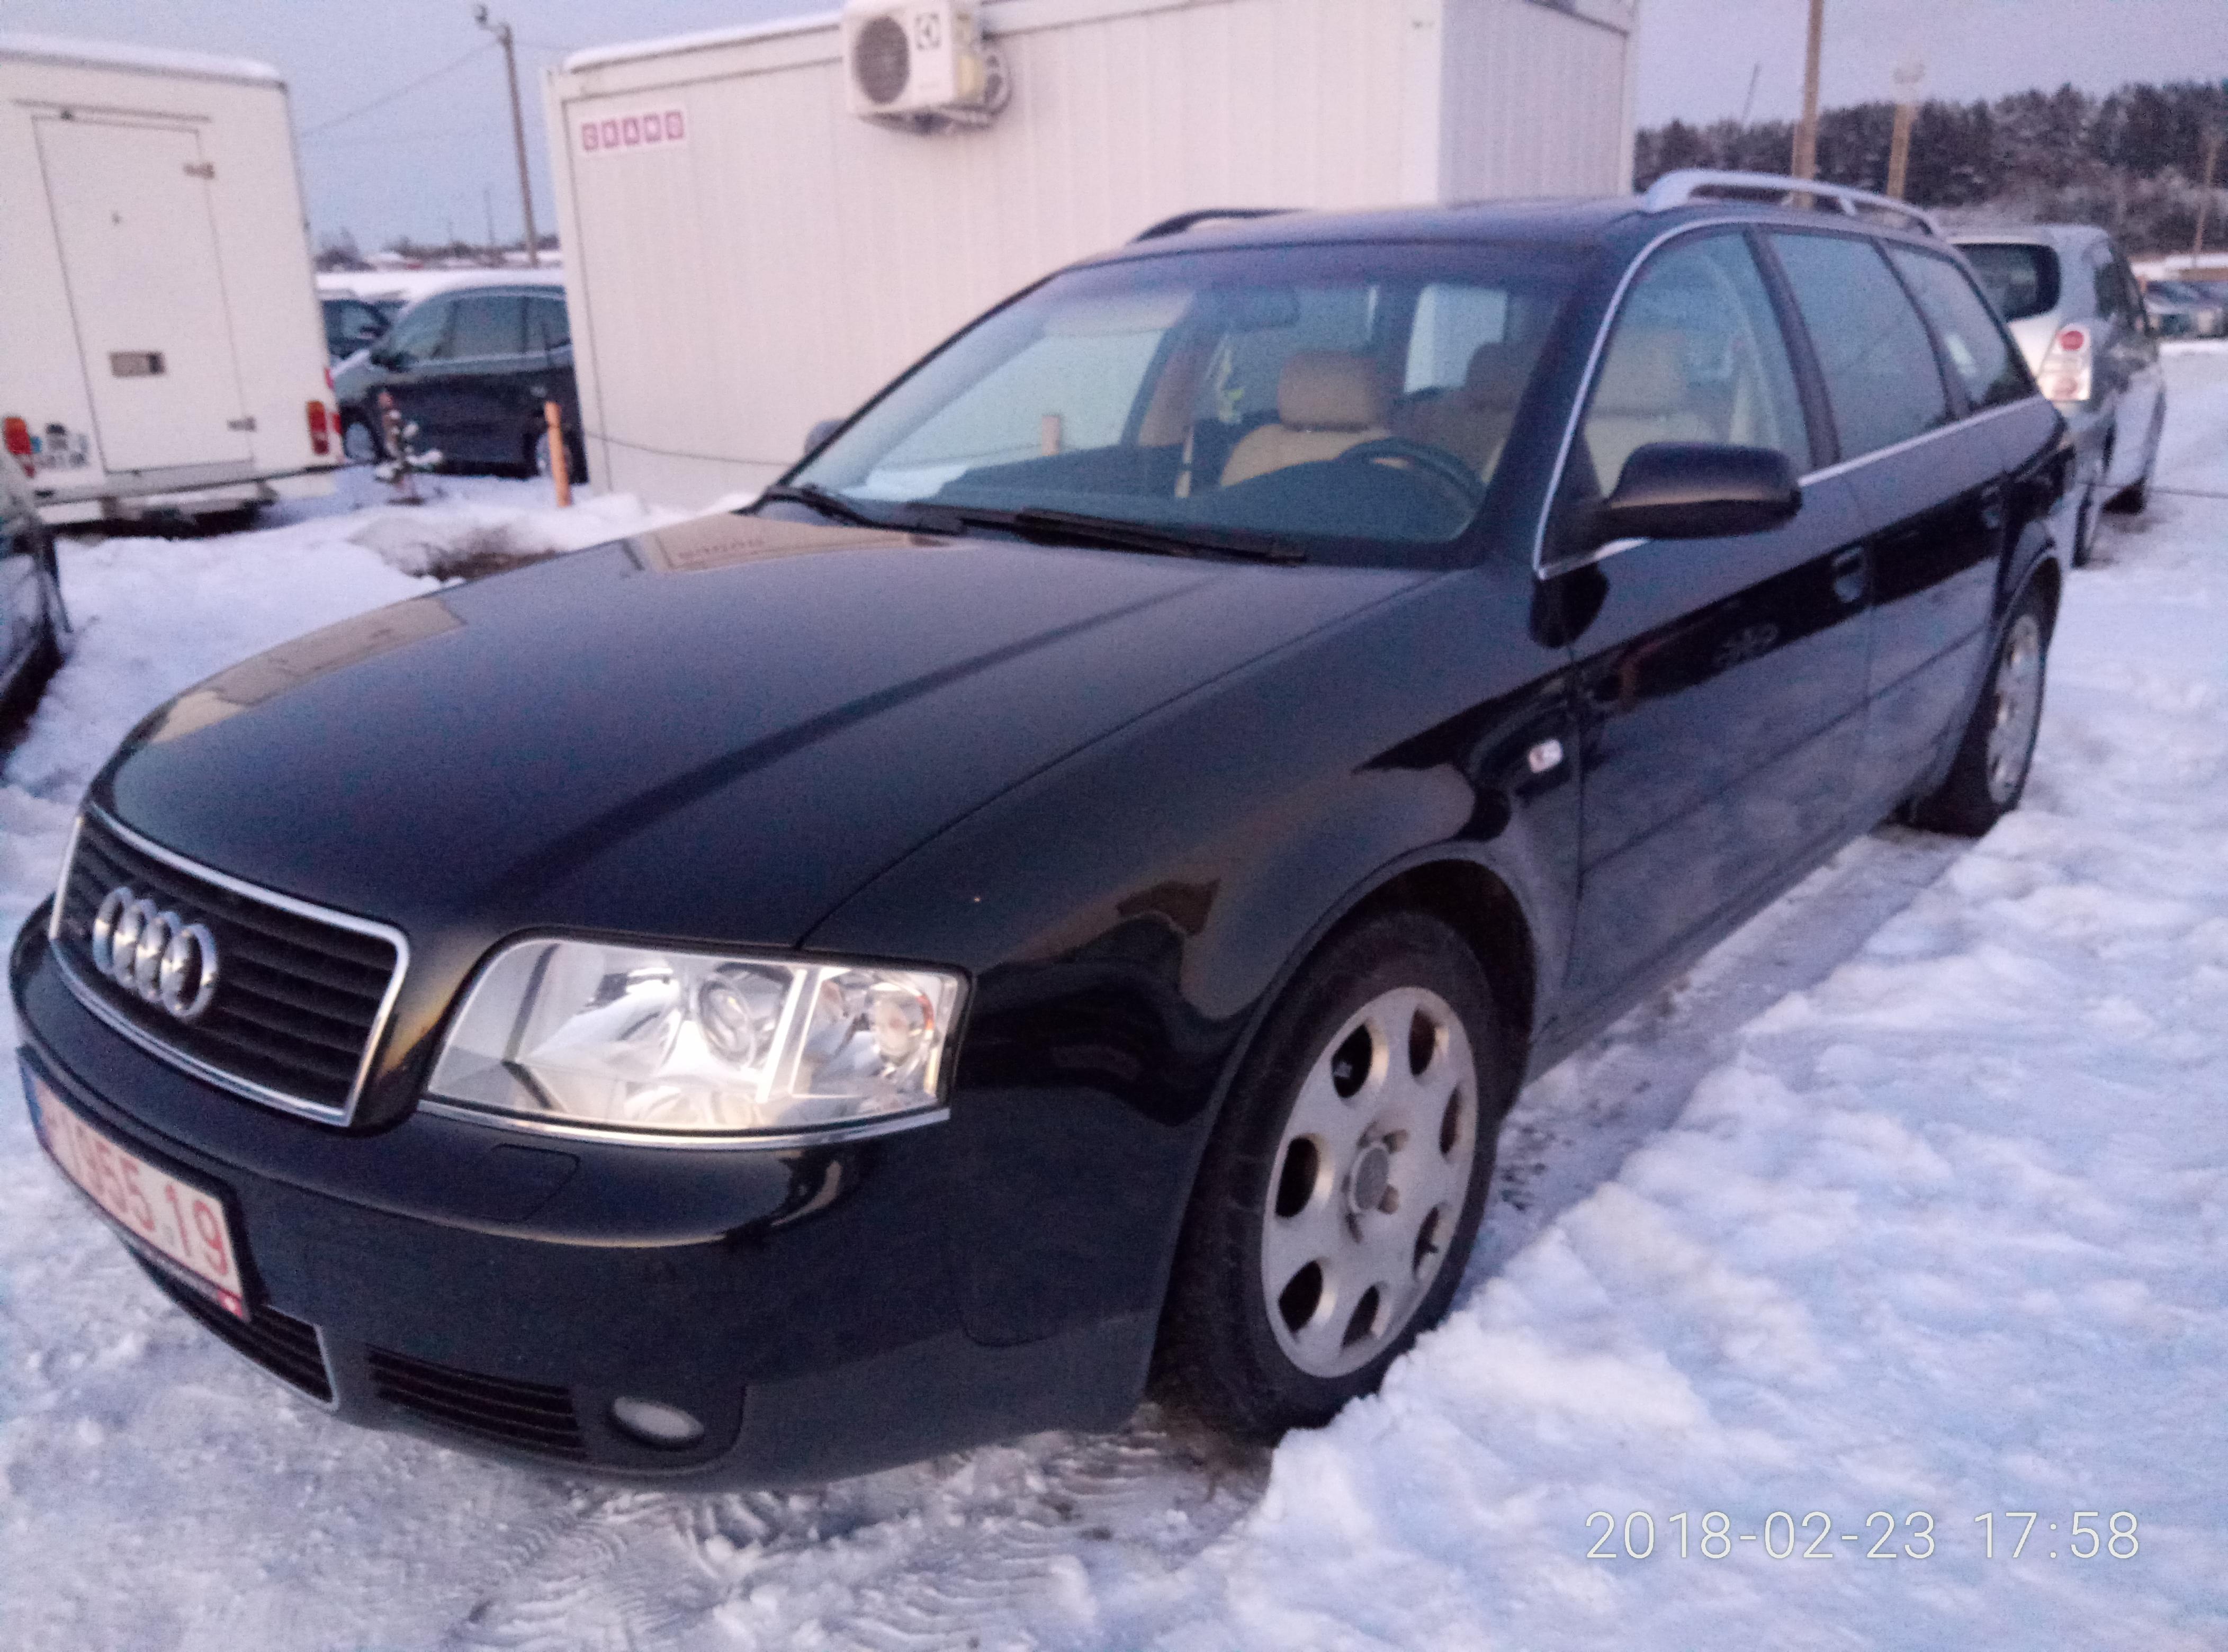 AUDI A6 ,V6 2.5TDI,132KW, 11/2002